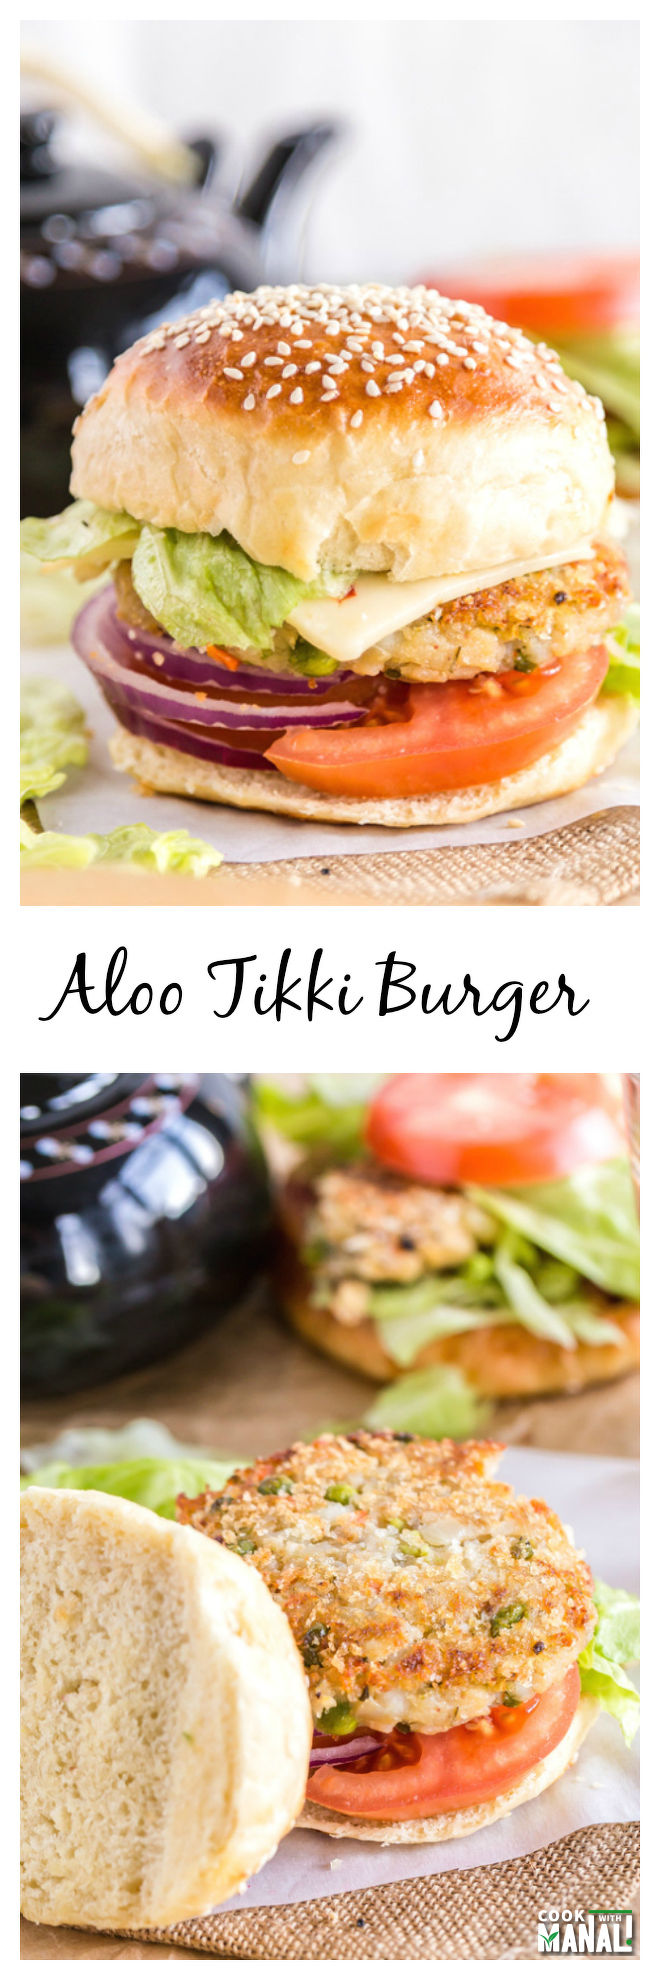 Aloo Tikki Burger Collage